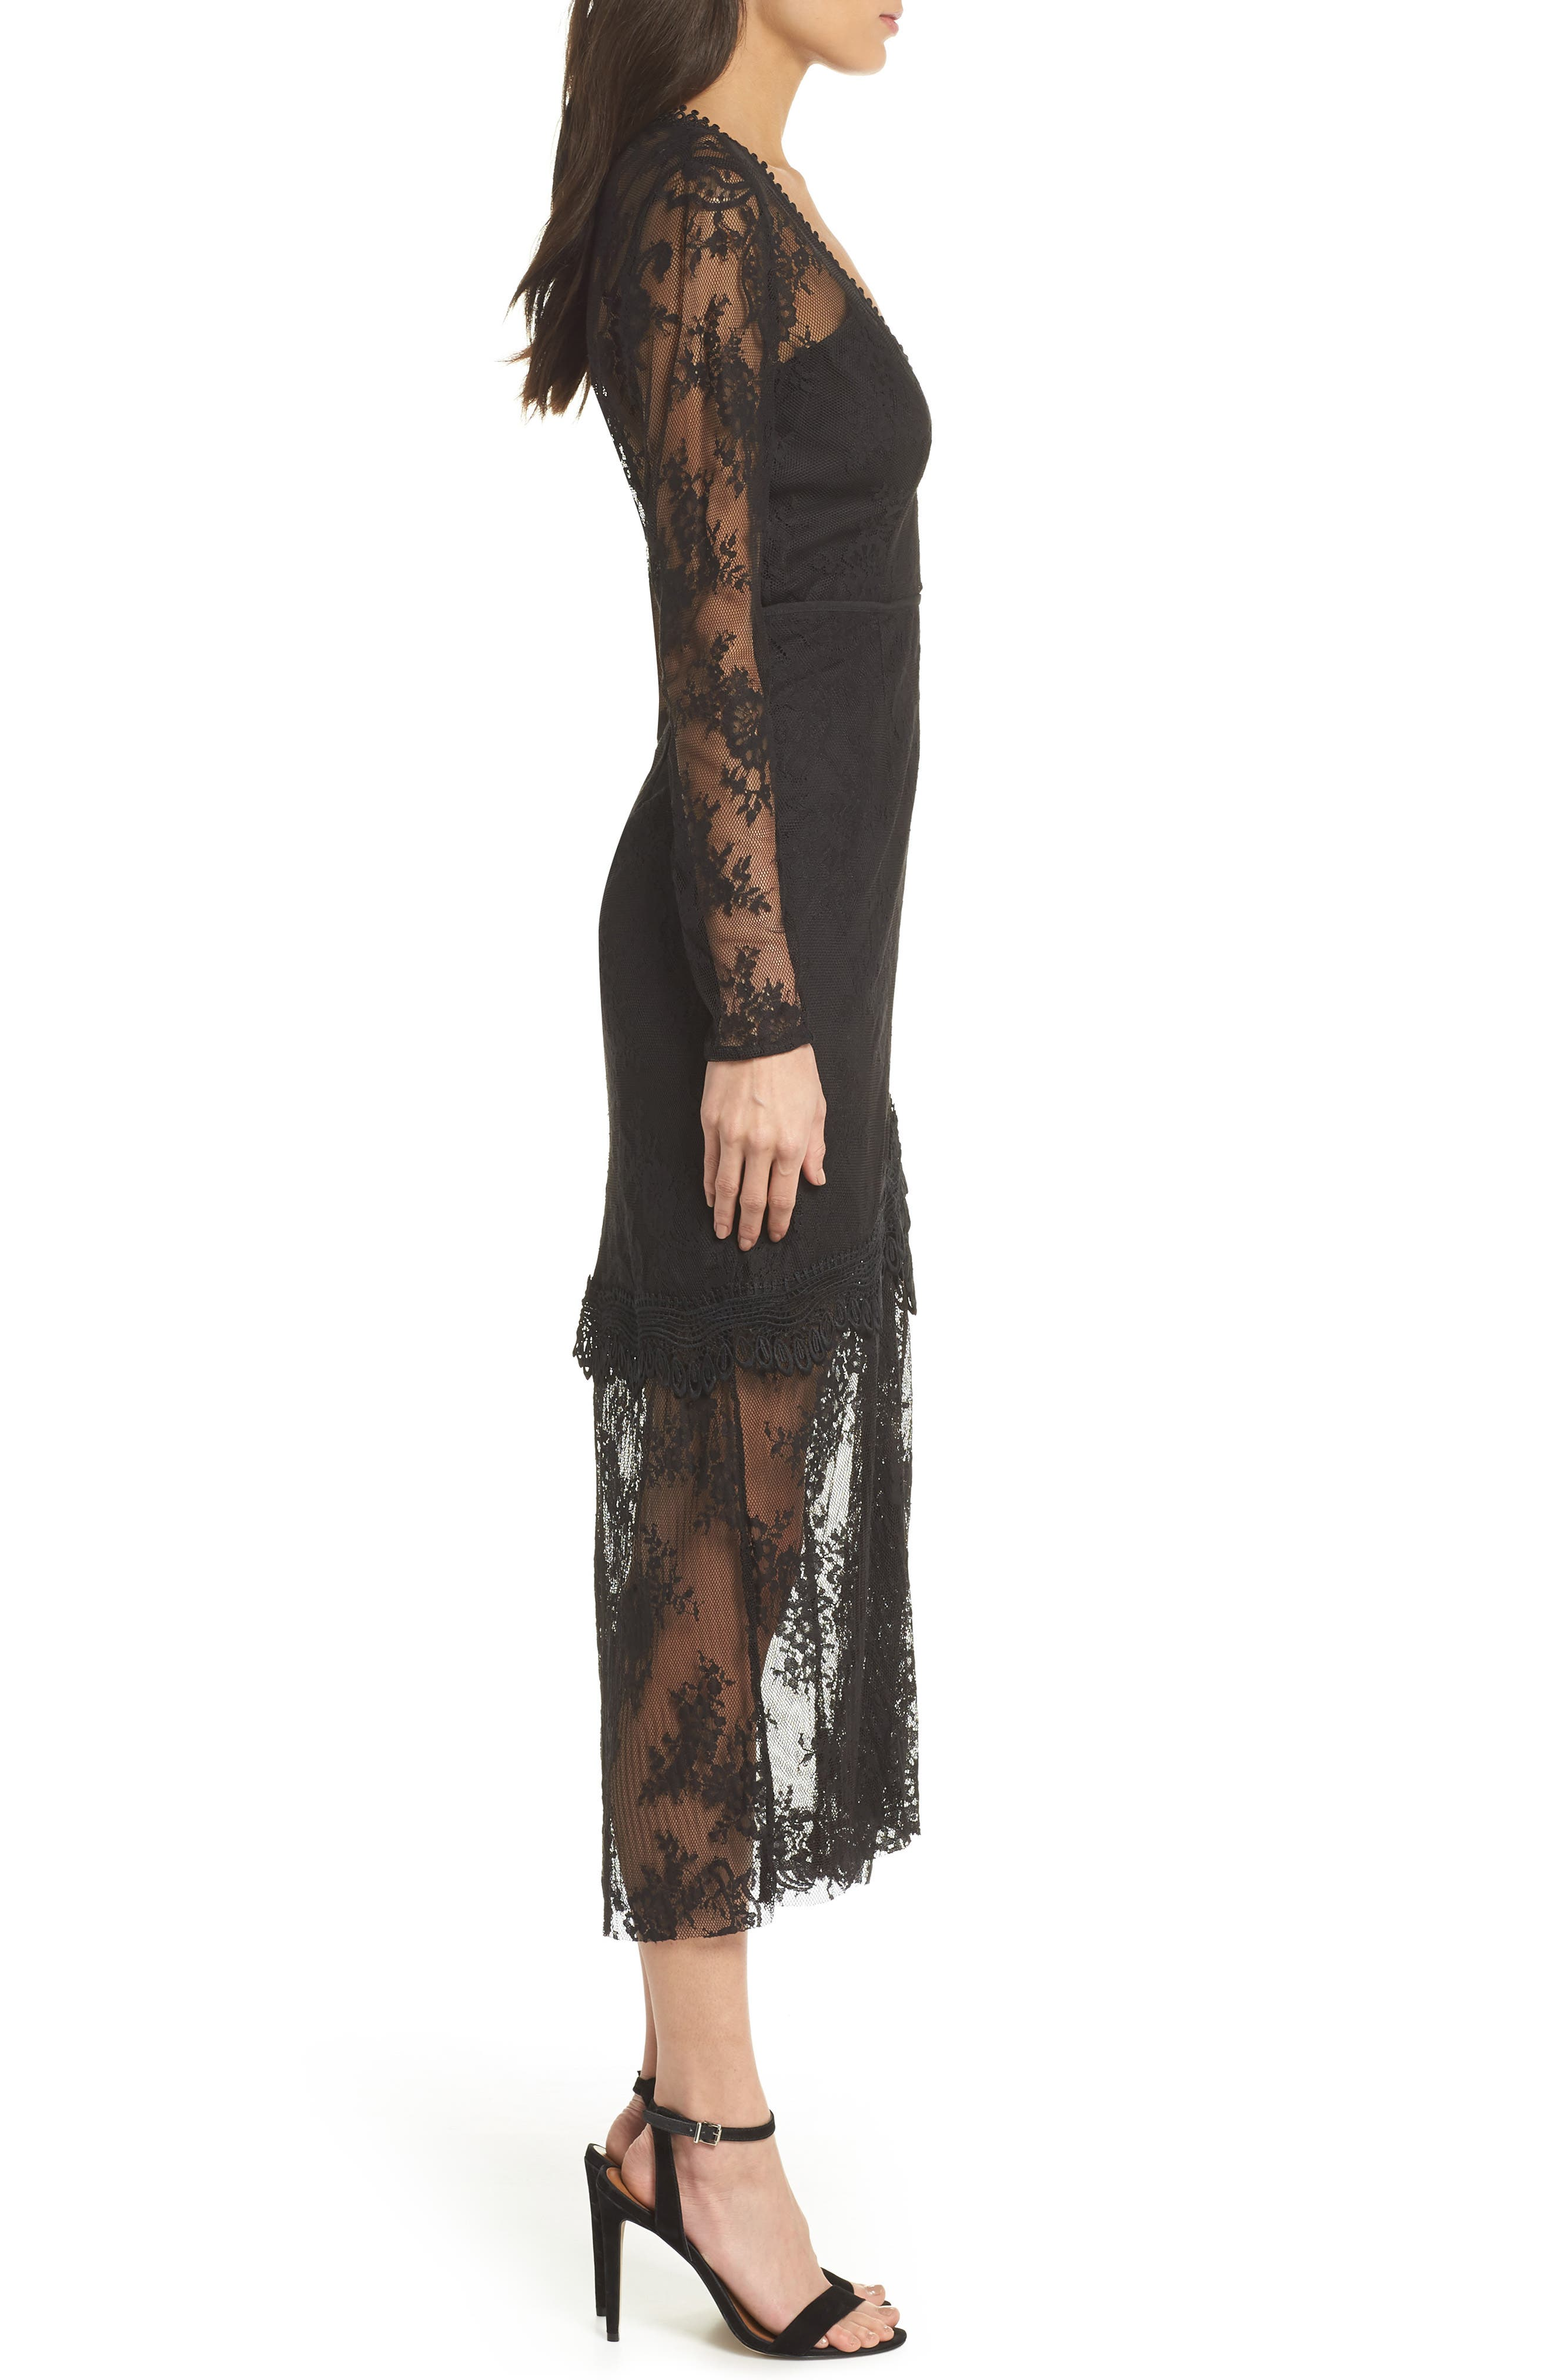 True Chemistry Lace Sheath Dress,                             Alternate thumbnail 3, color,                             001